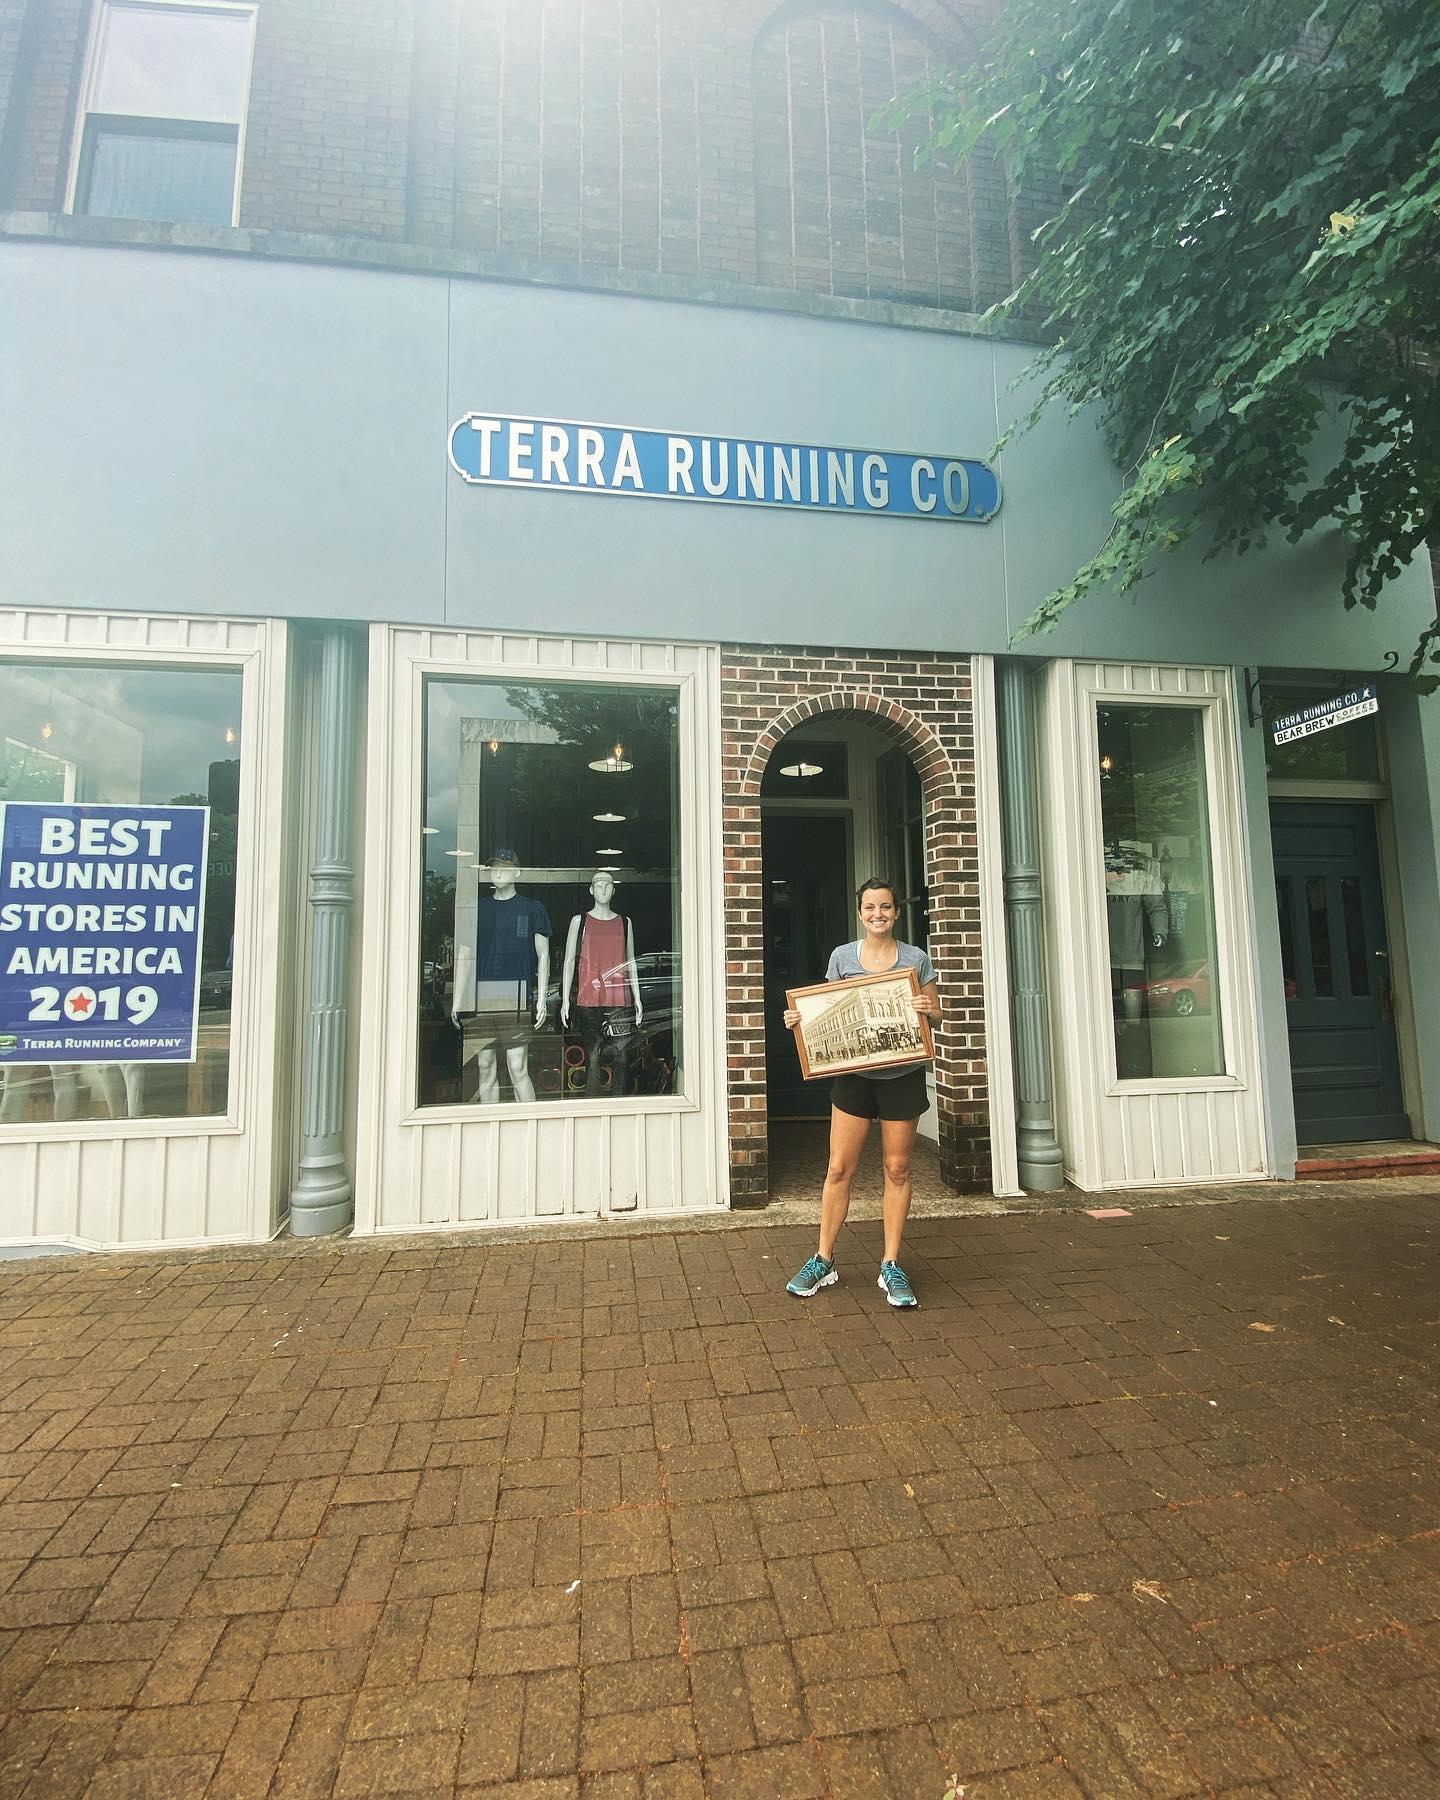 Terra Running Cleveland TN